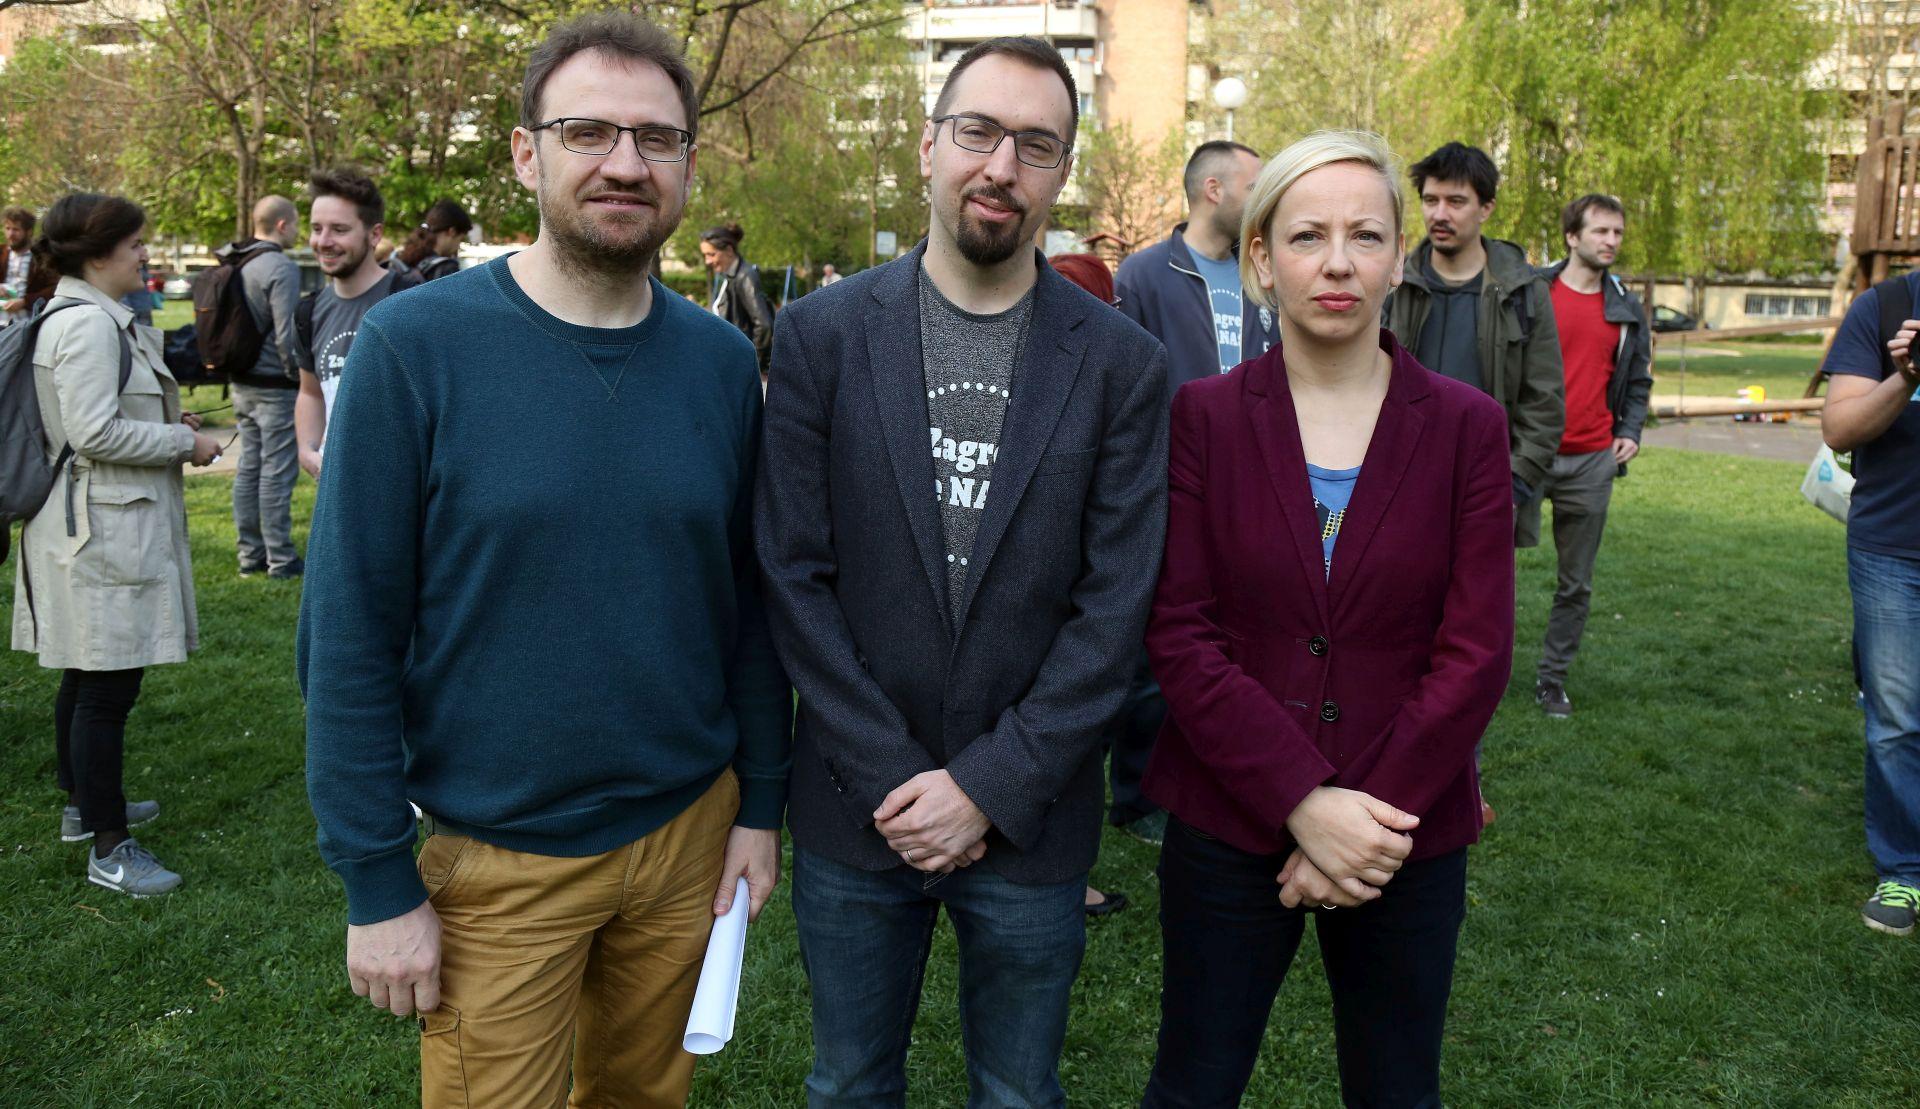 Tomislav Tomašević kandidat platforme 'Zagreb je naš!' za zagrebačkog gradonačelnika